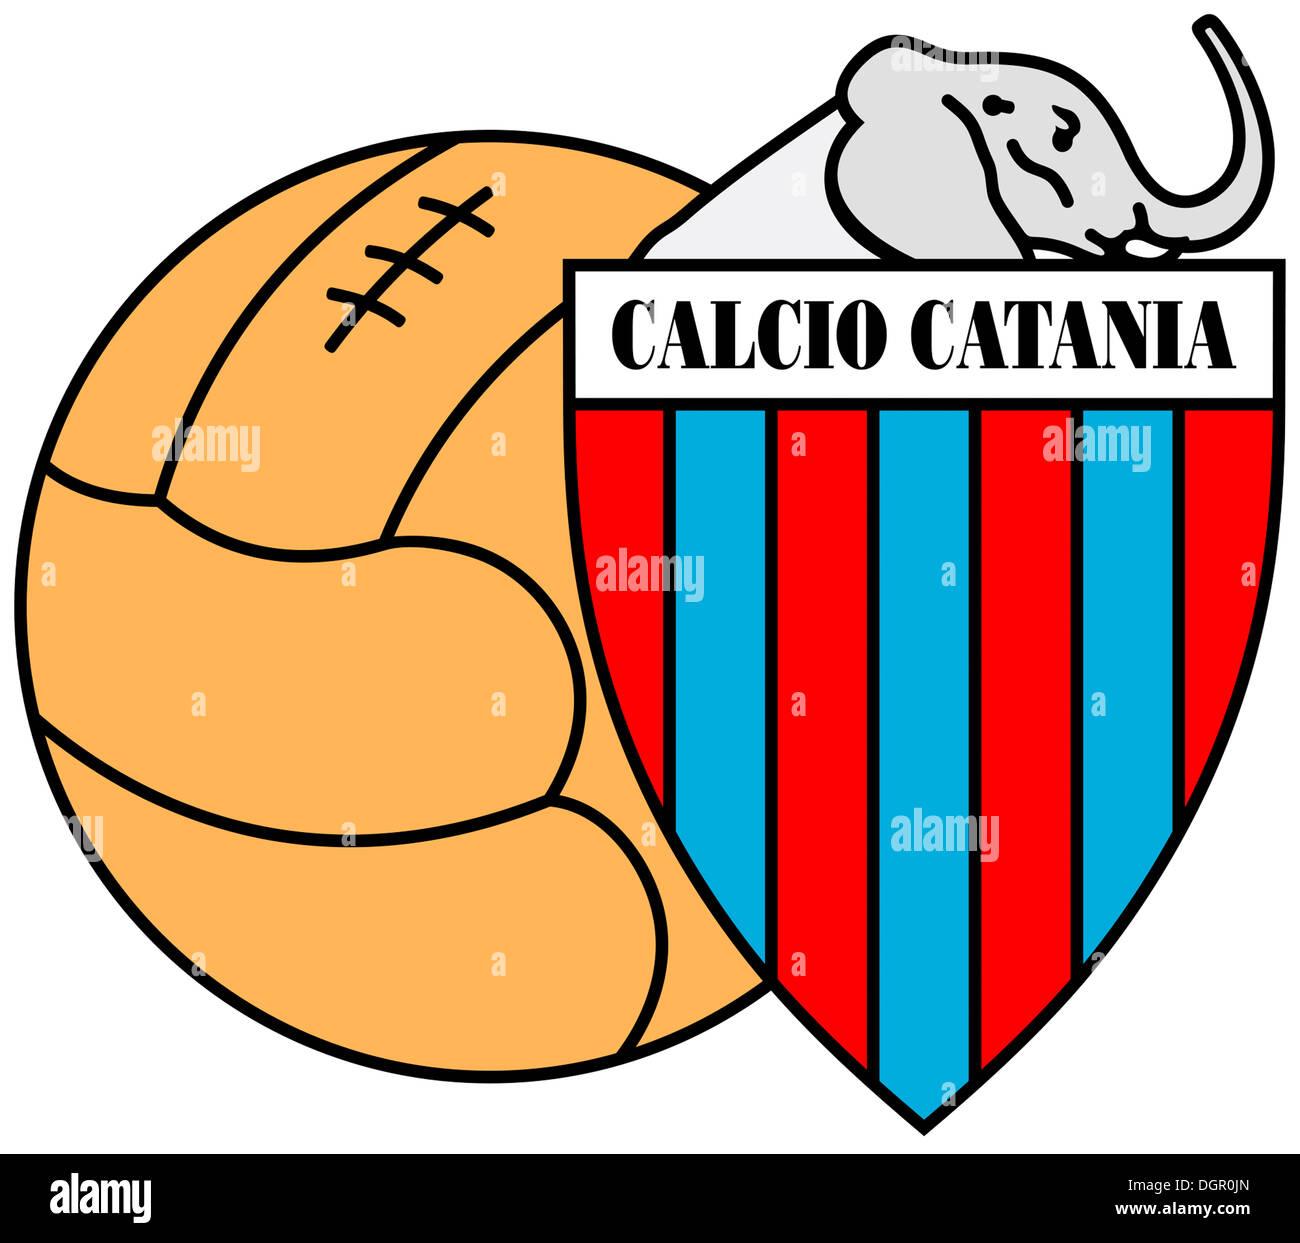 Logo Der Italienischen Fussball Nationalmannschaft Calcio